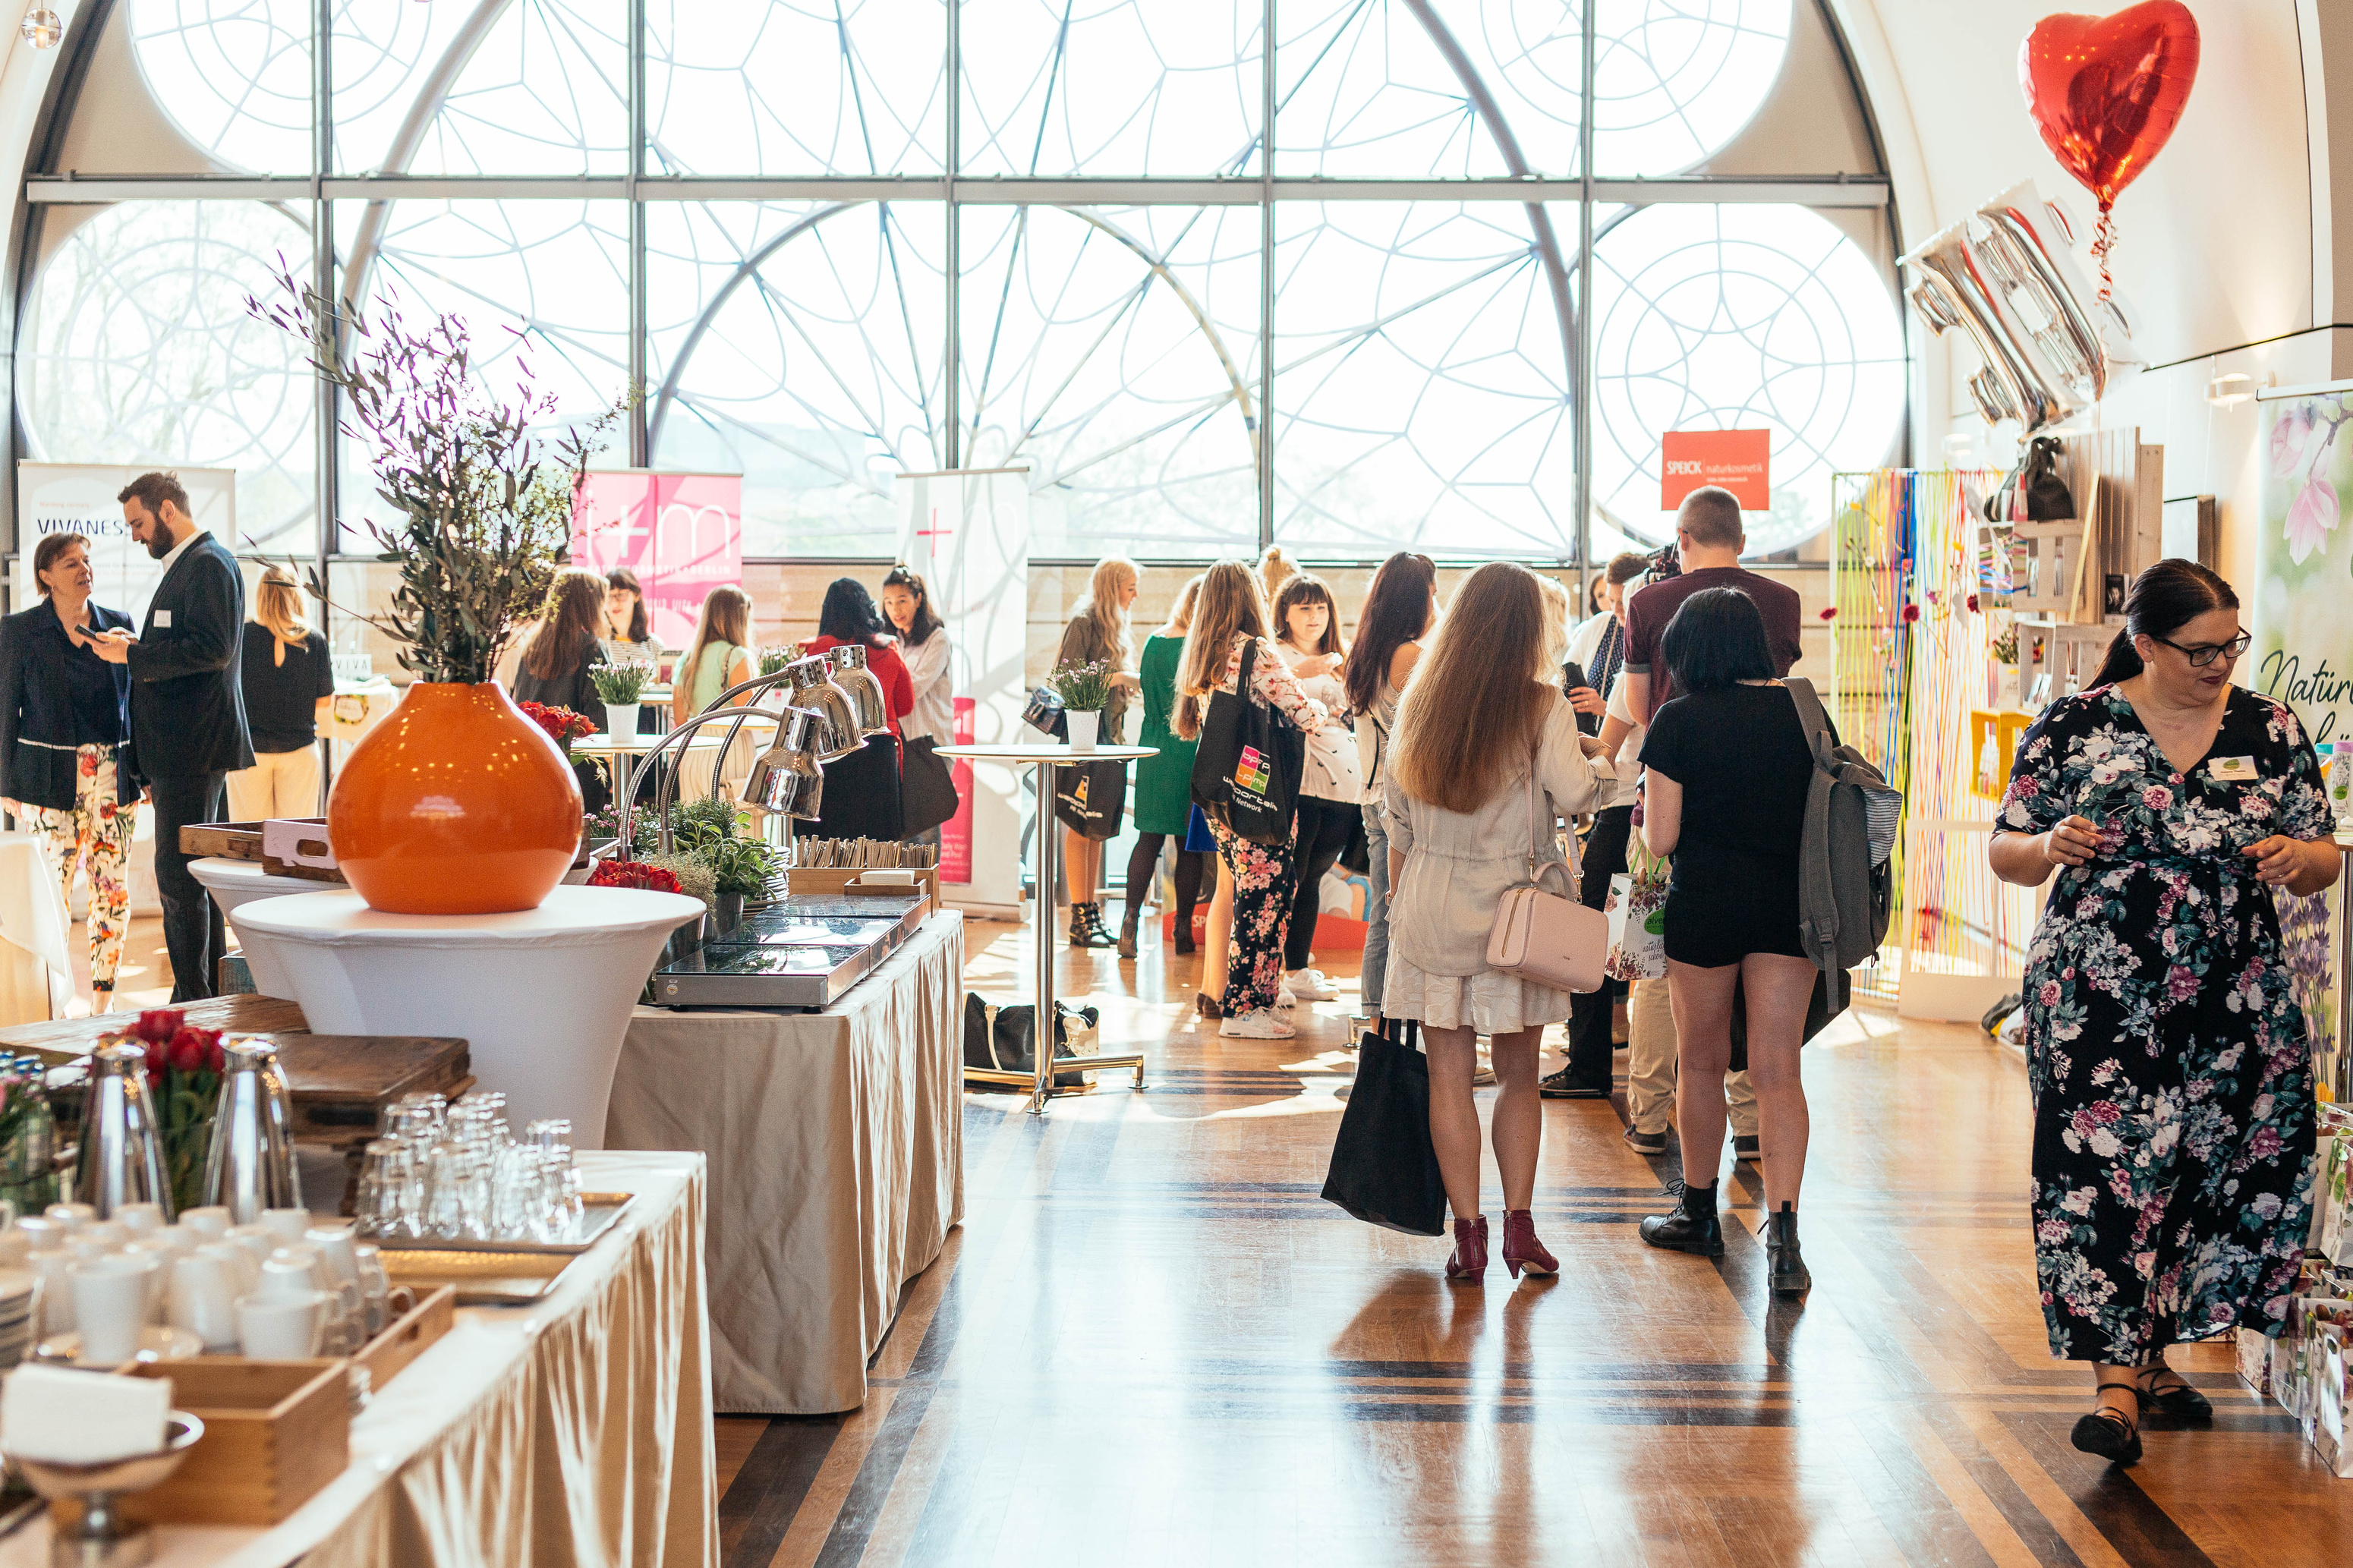 Bild: Beautypress Event, Köln, Webportalis, Blogger, Beautyblogger, Naturkosmetik, Blogger Berlin, Köln, Flora